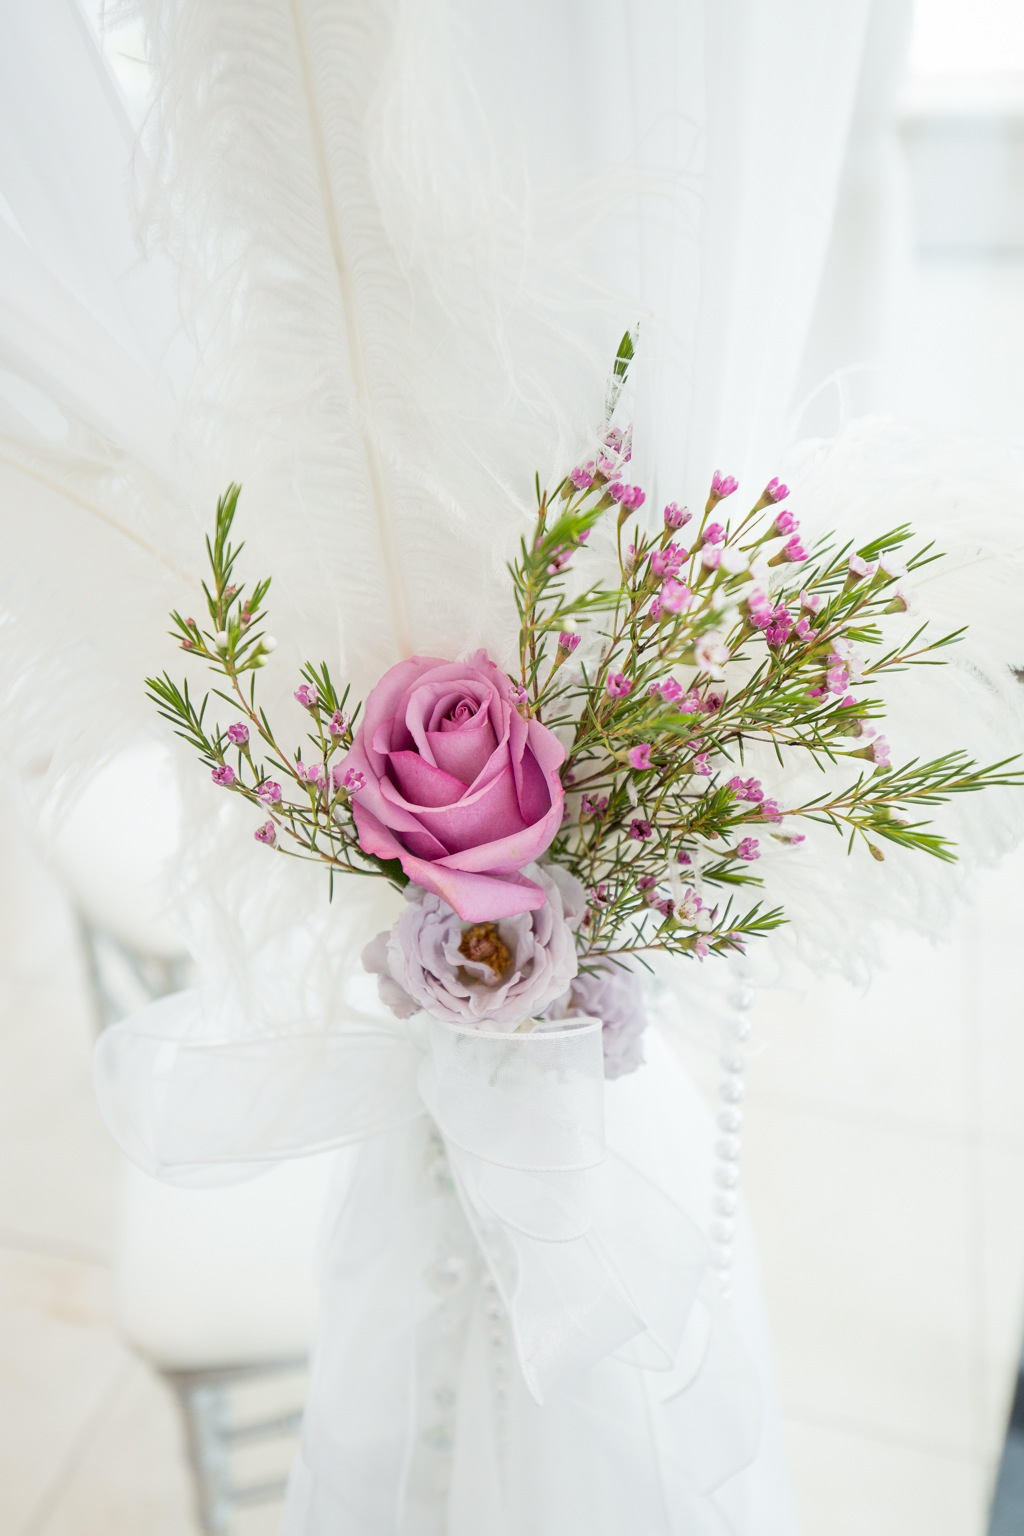 Pastel Purple and Pink Wedding Ceremony Flowers & Decor